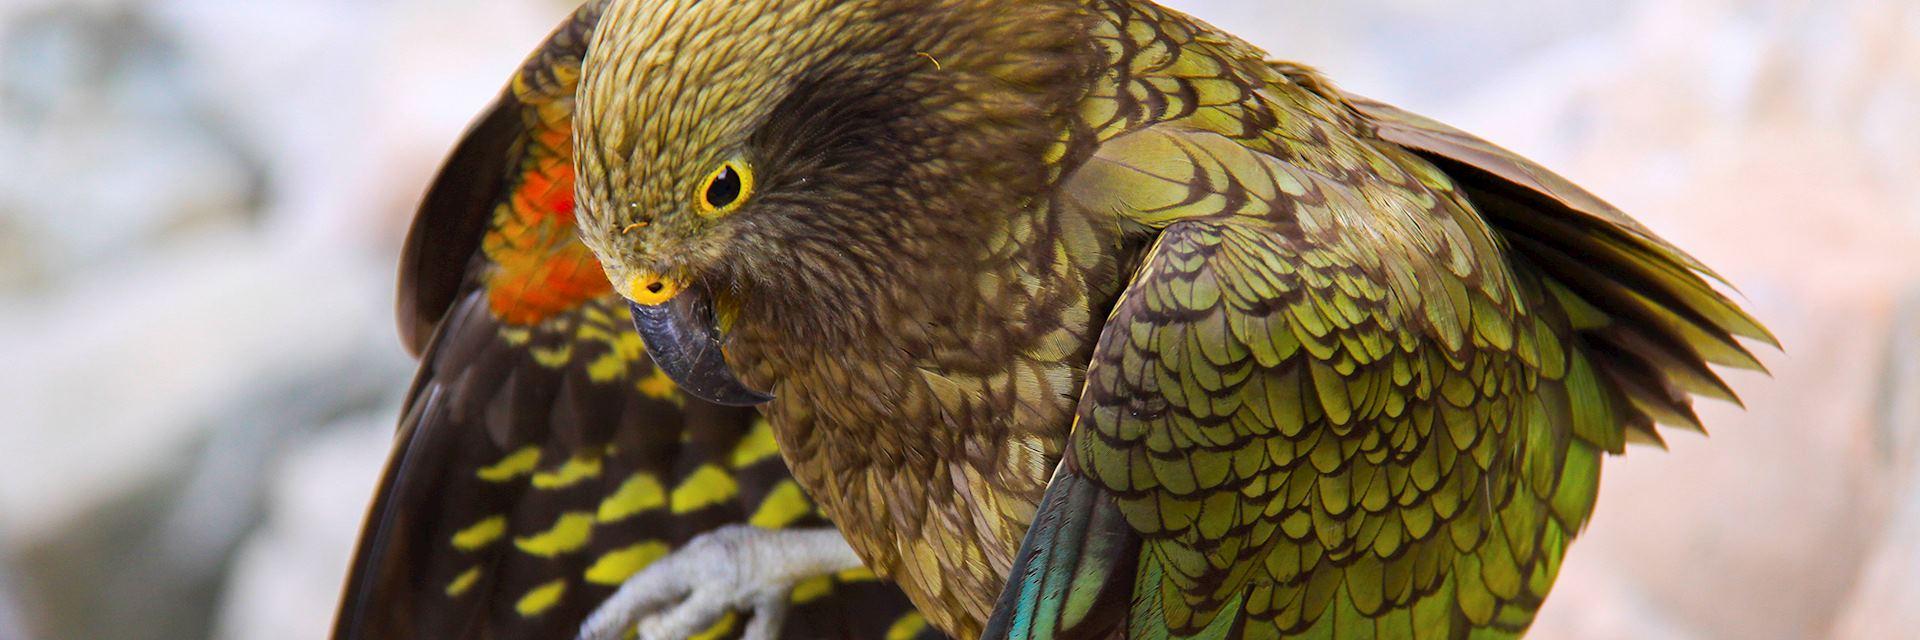 Kea Bird, Aoraki National Park